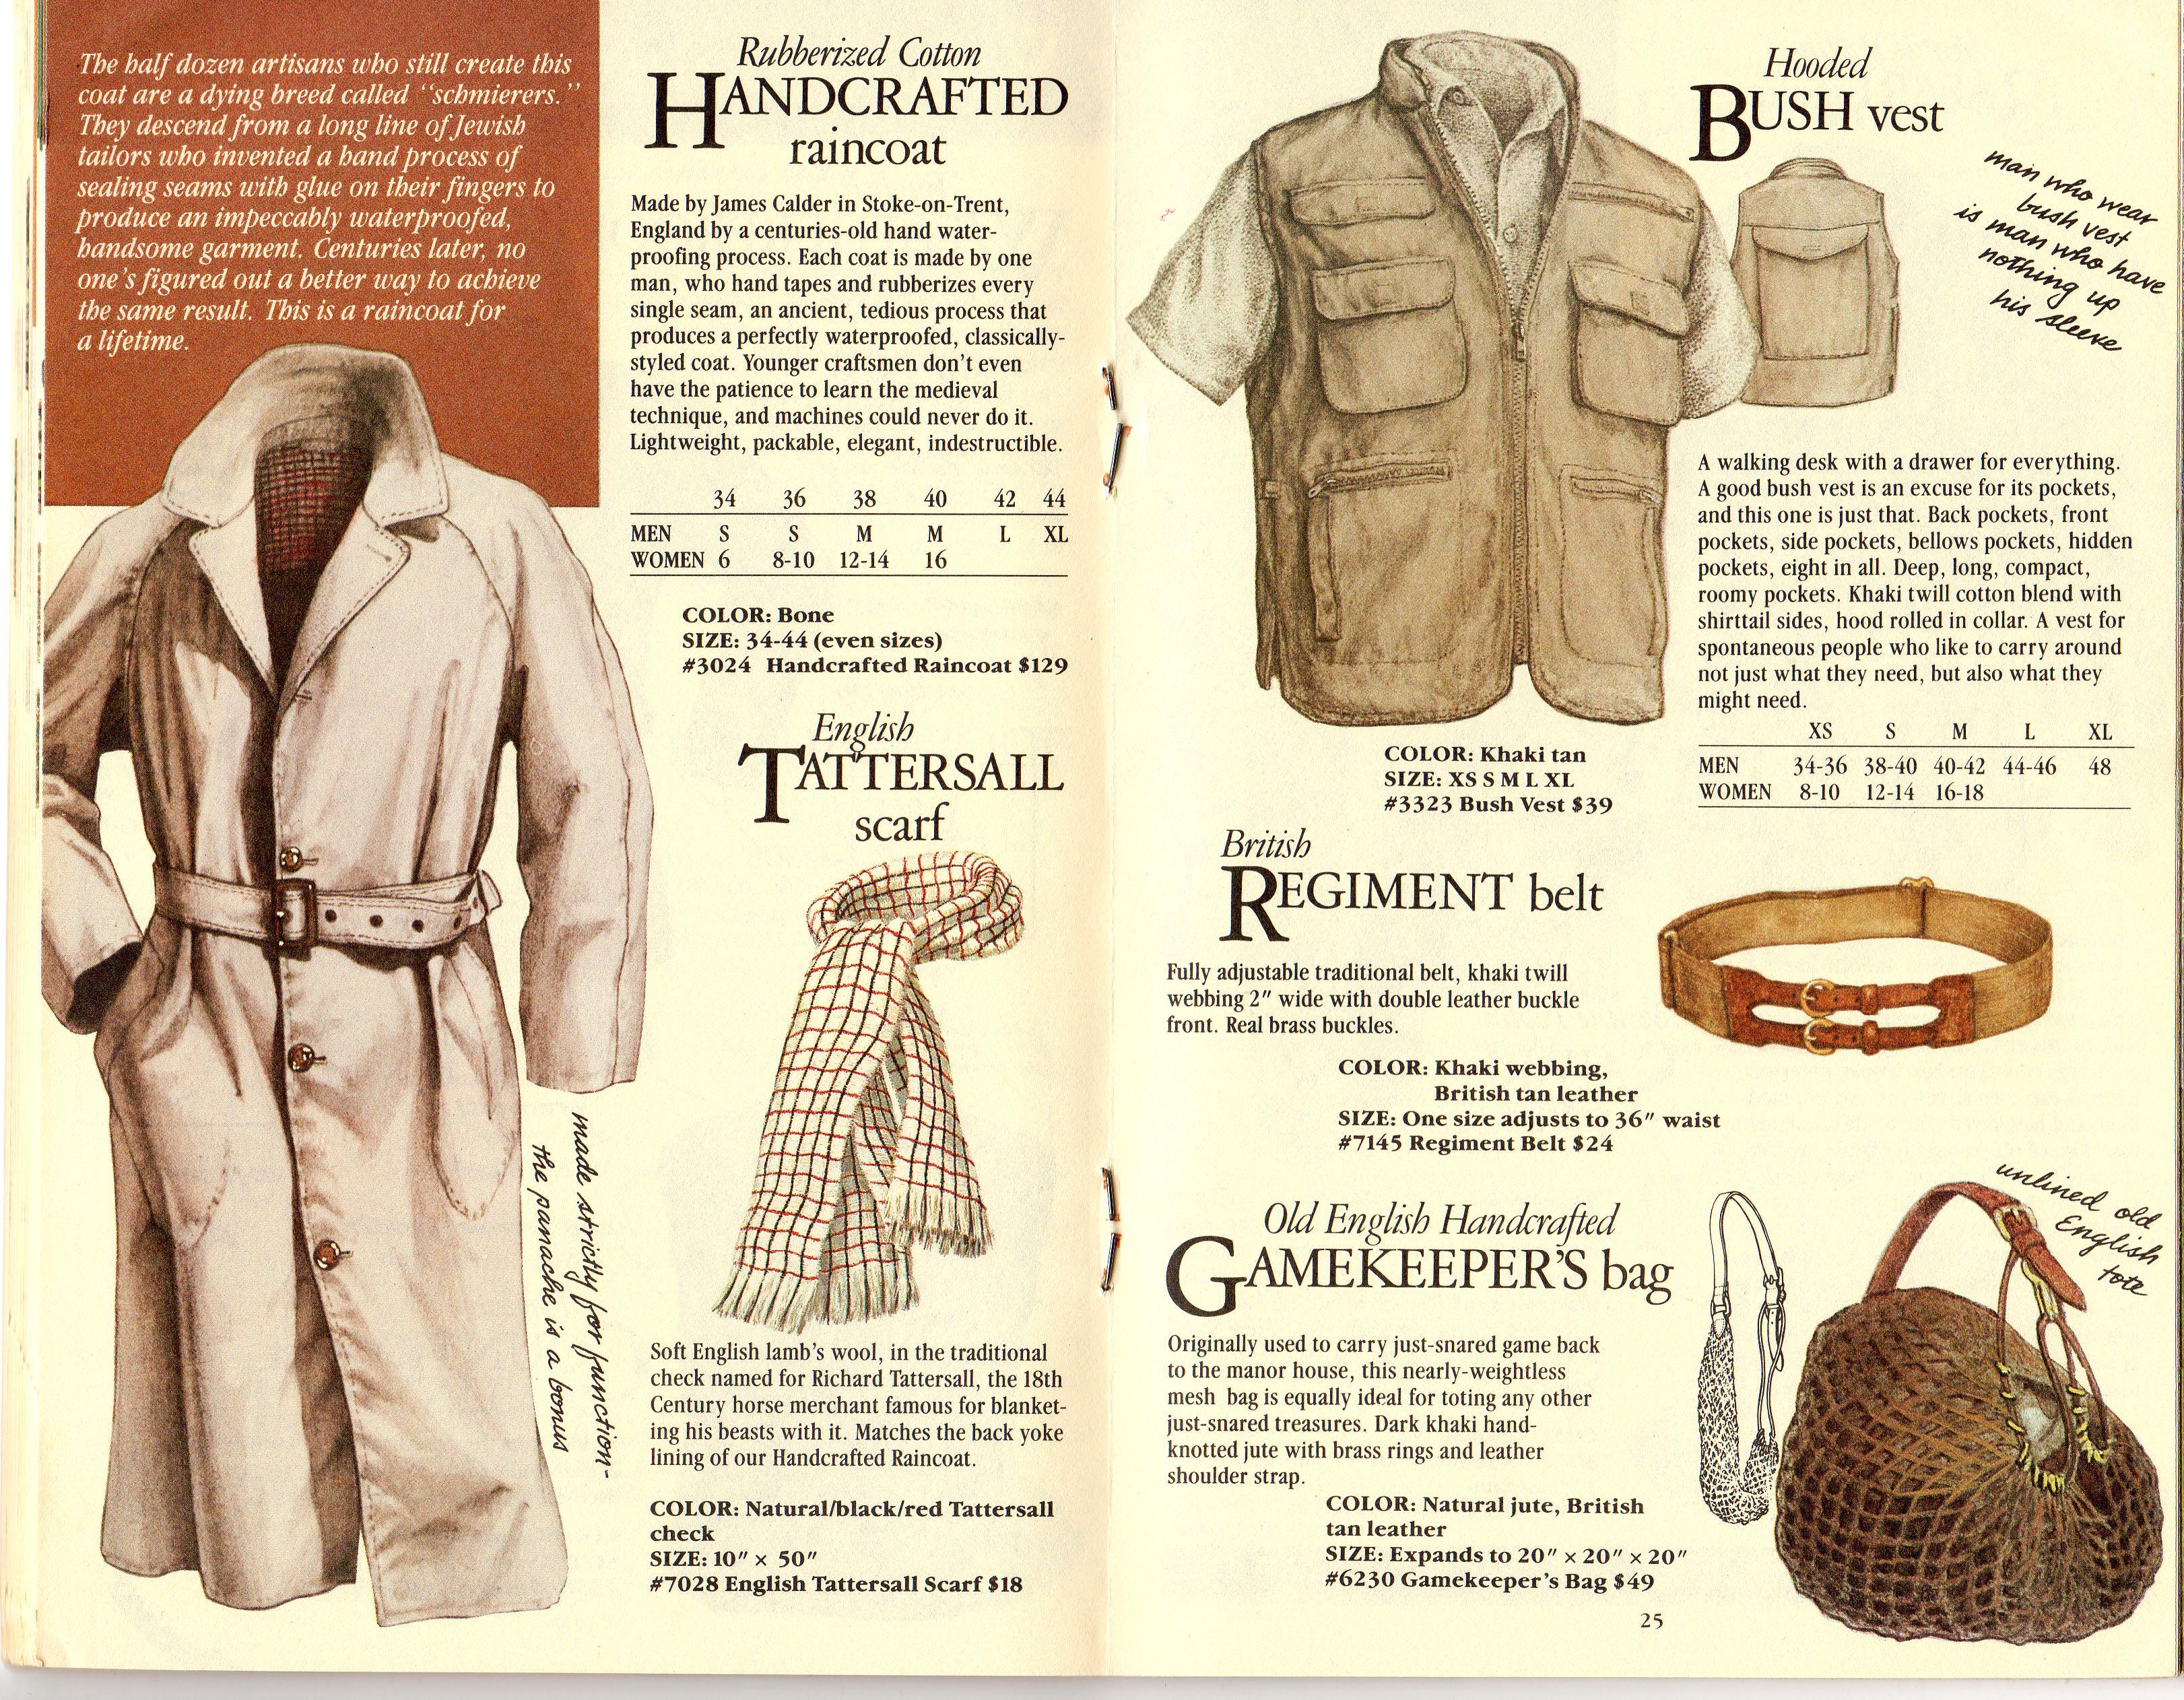 Banana Republic #21 Christmas 1984 Handcrafted Raincoat, Tattersall Scarf, Hooded Bush Vest, British Regiment Belt, Gamekeeper's Bag